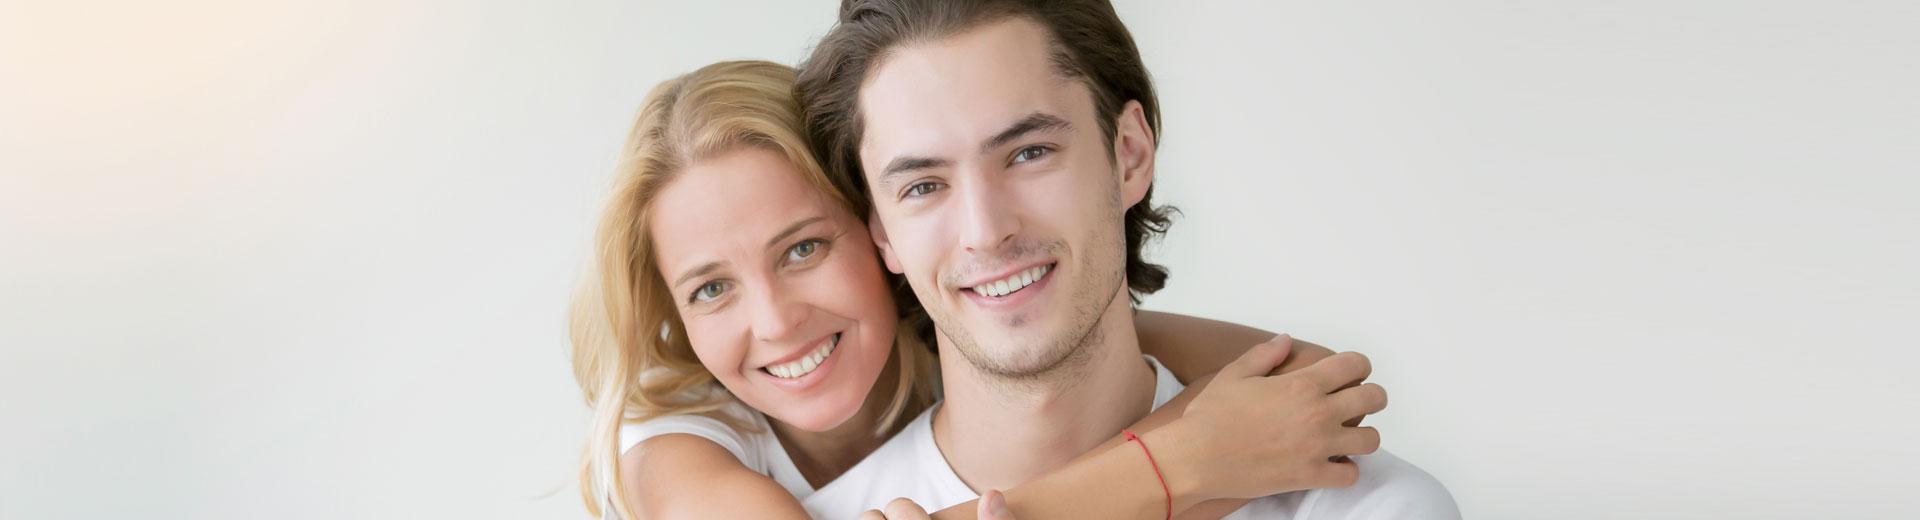 Dental Designs of Owensboro Dental Services